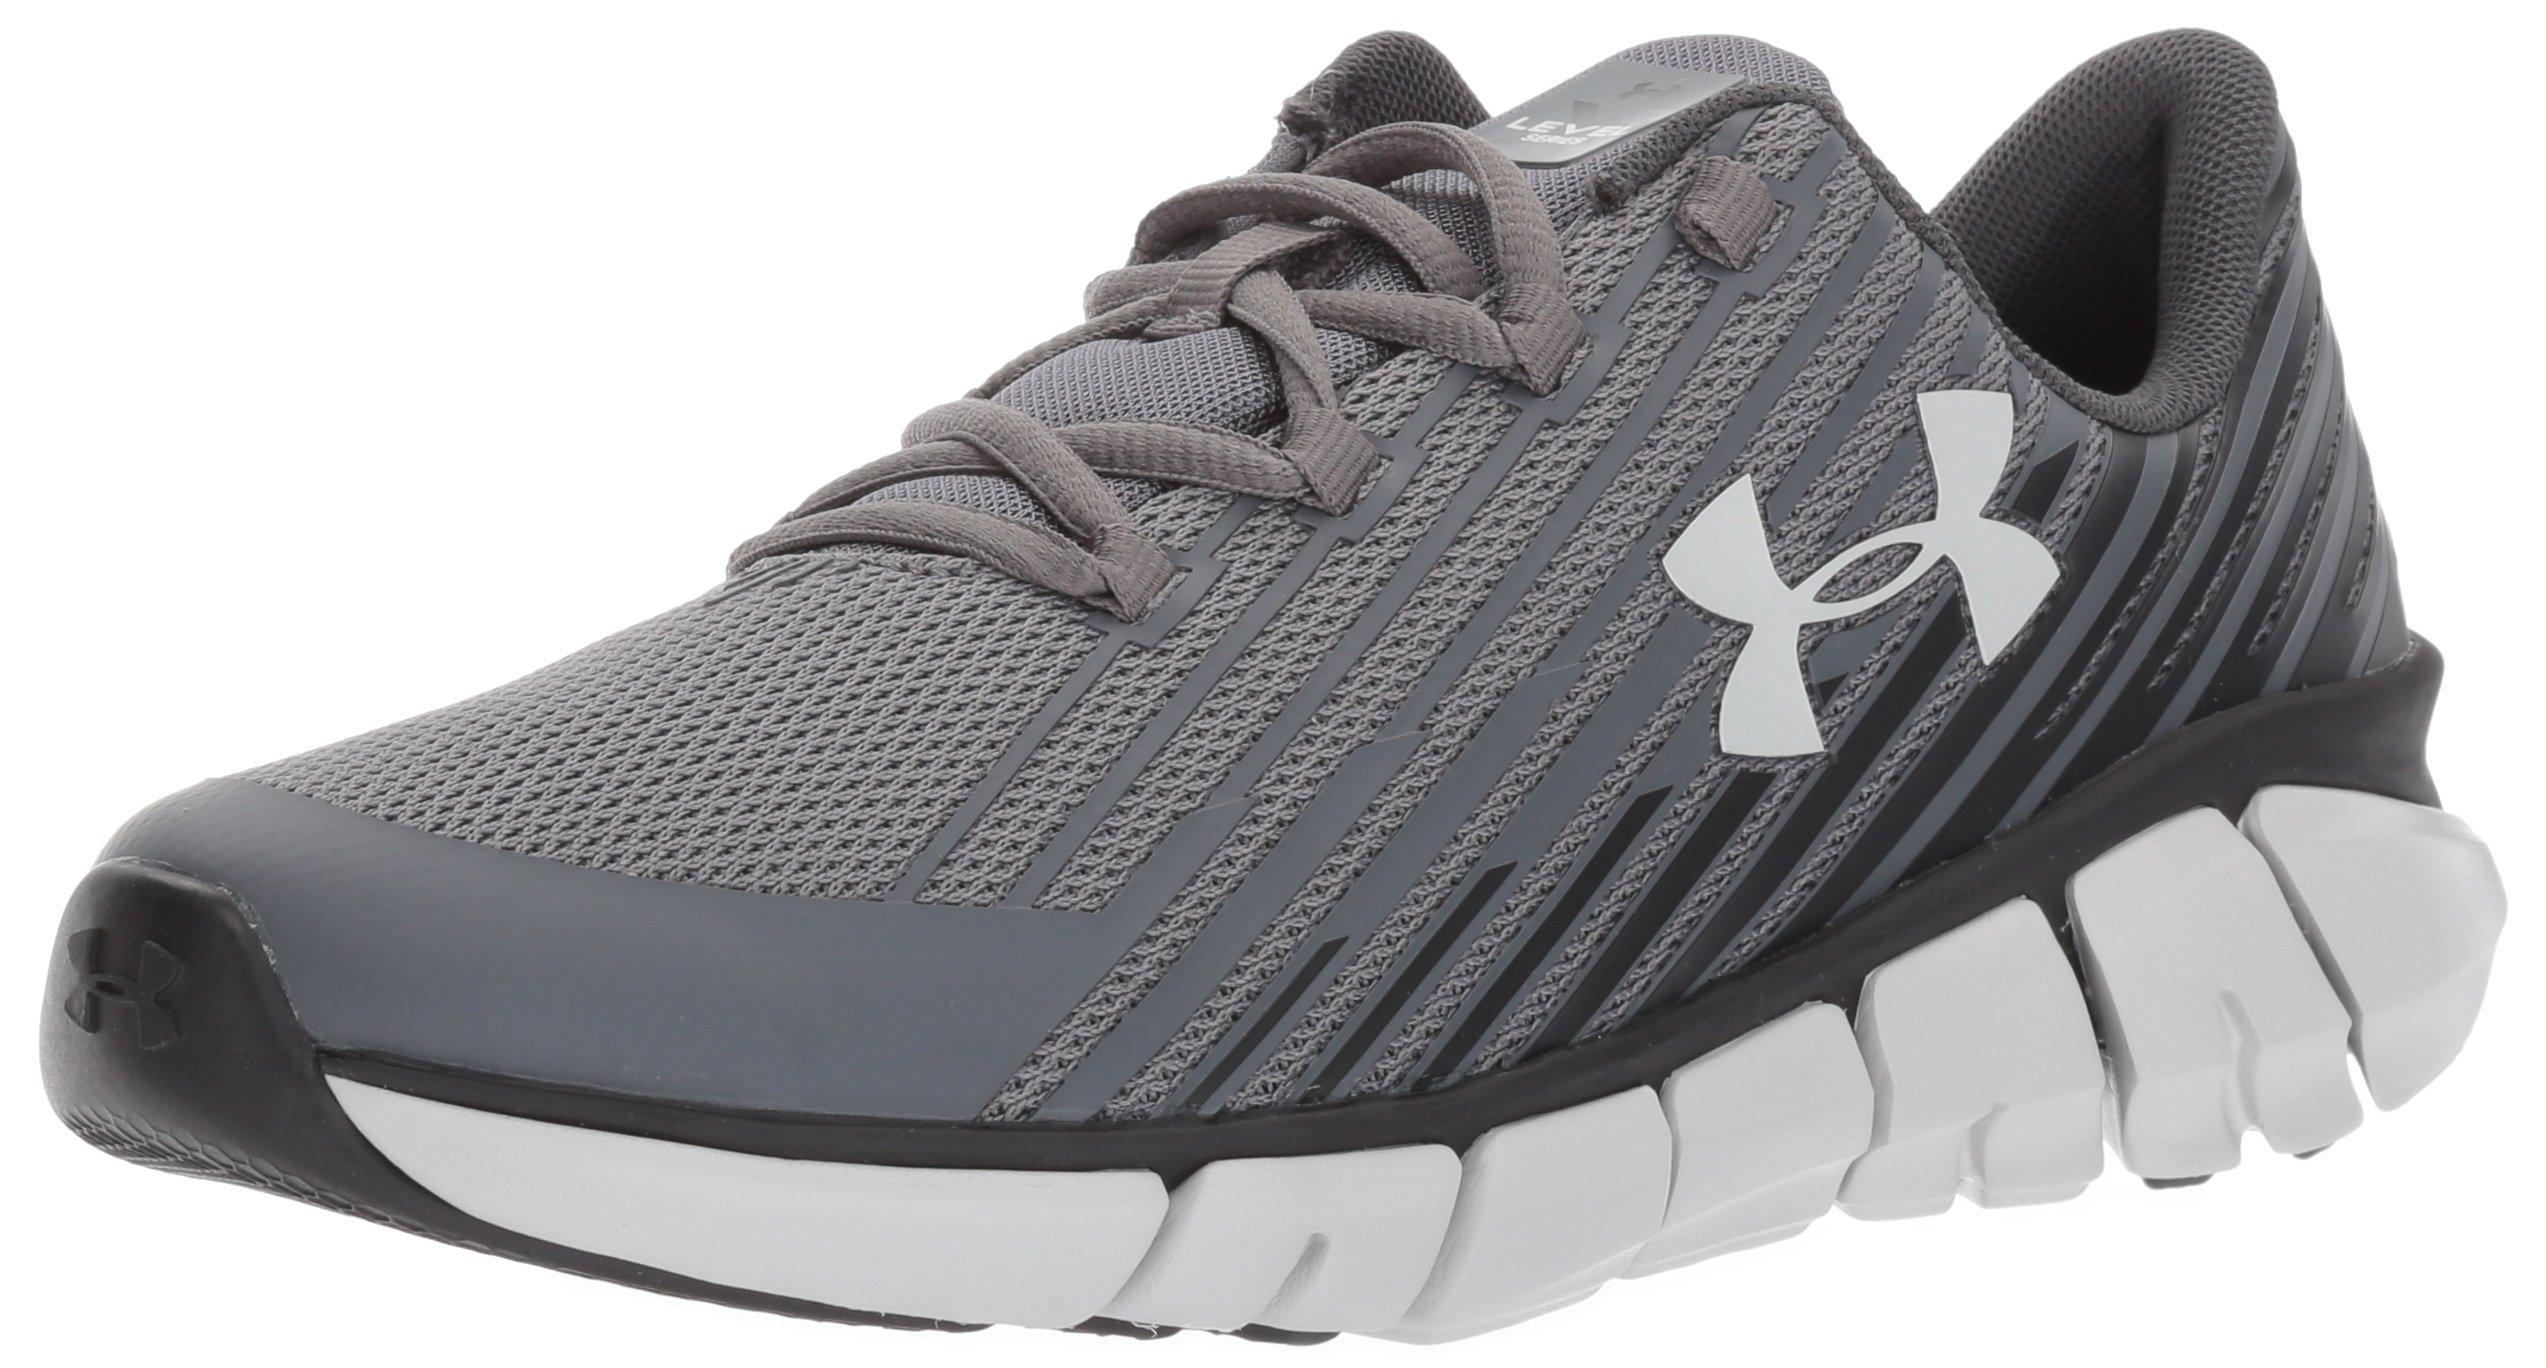 dab73bd6647ce Galleon - Under Armour Boys  Grade School X Level Scramjet Remix Athletic  Shoe